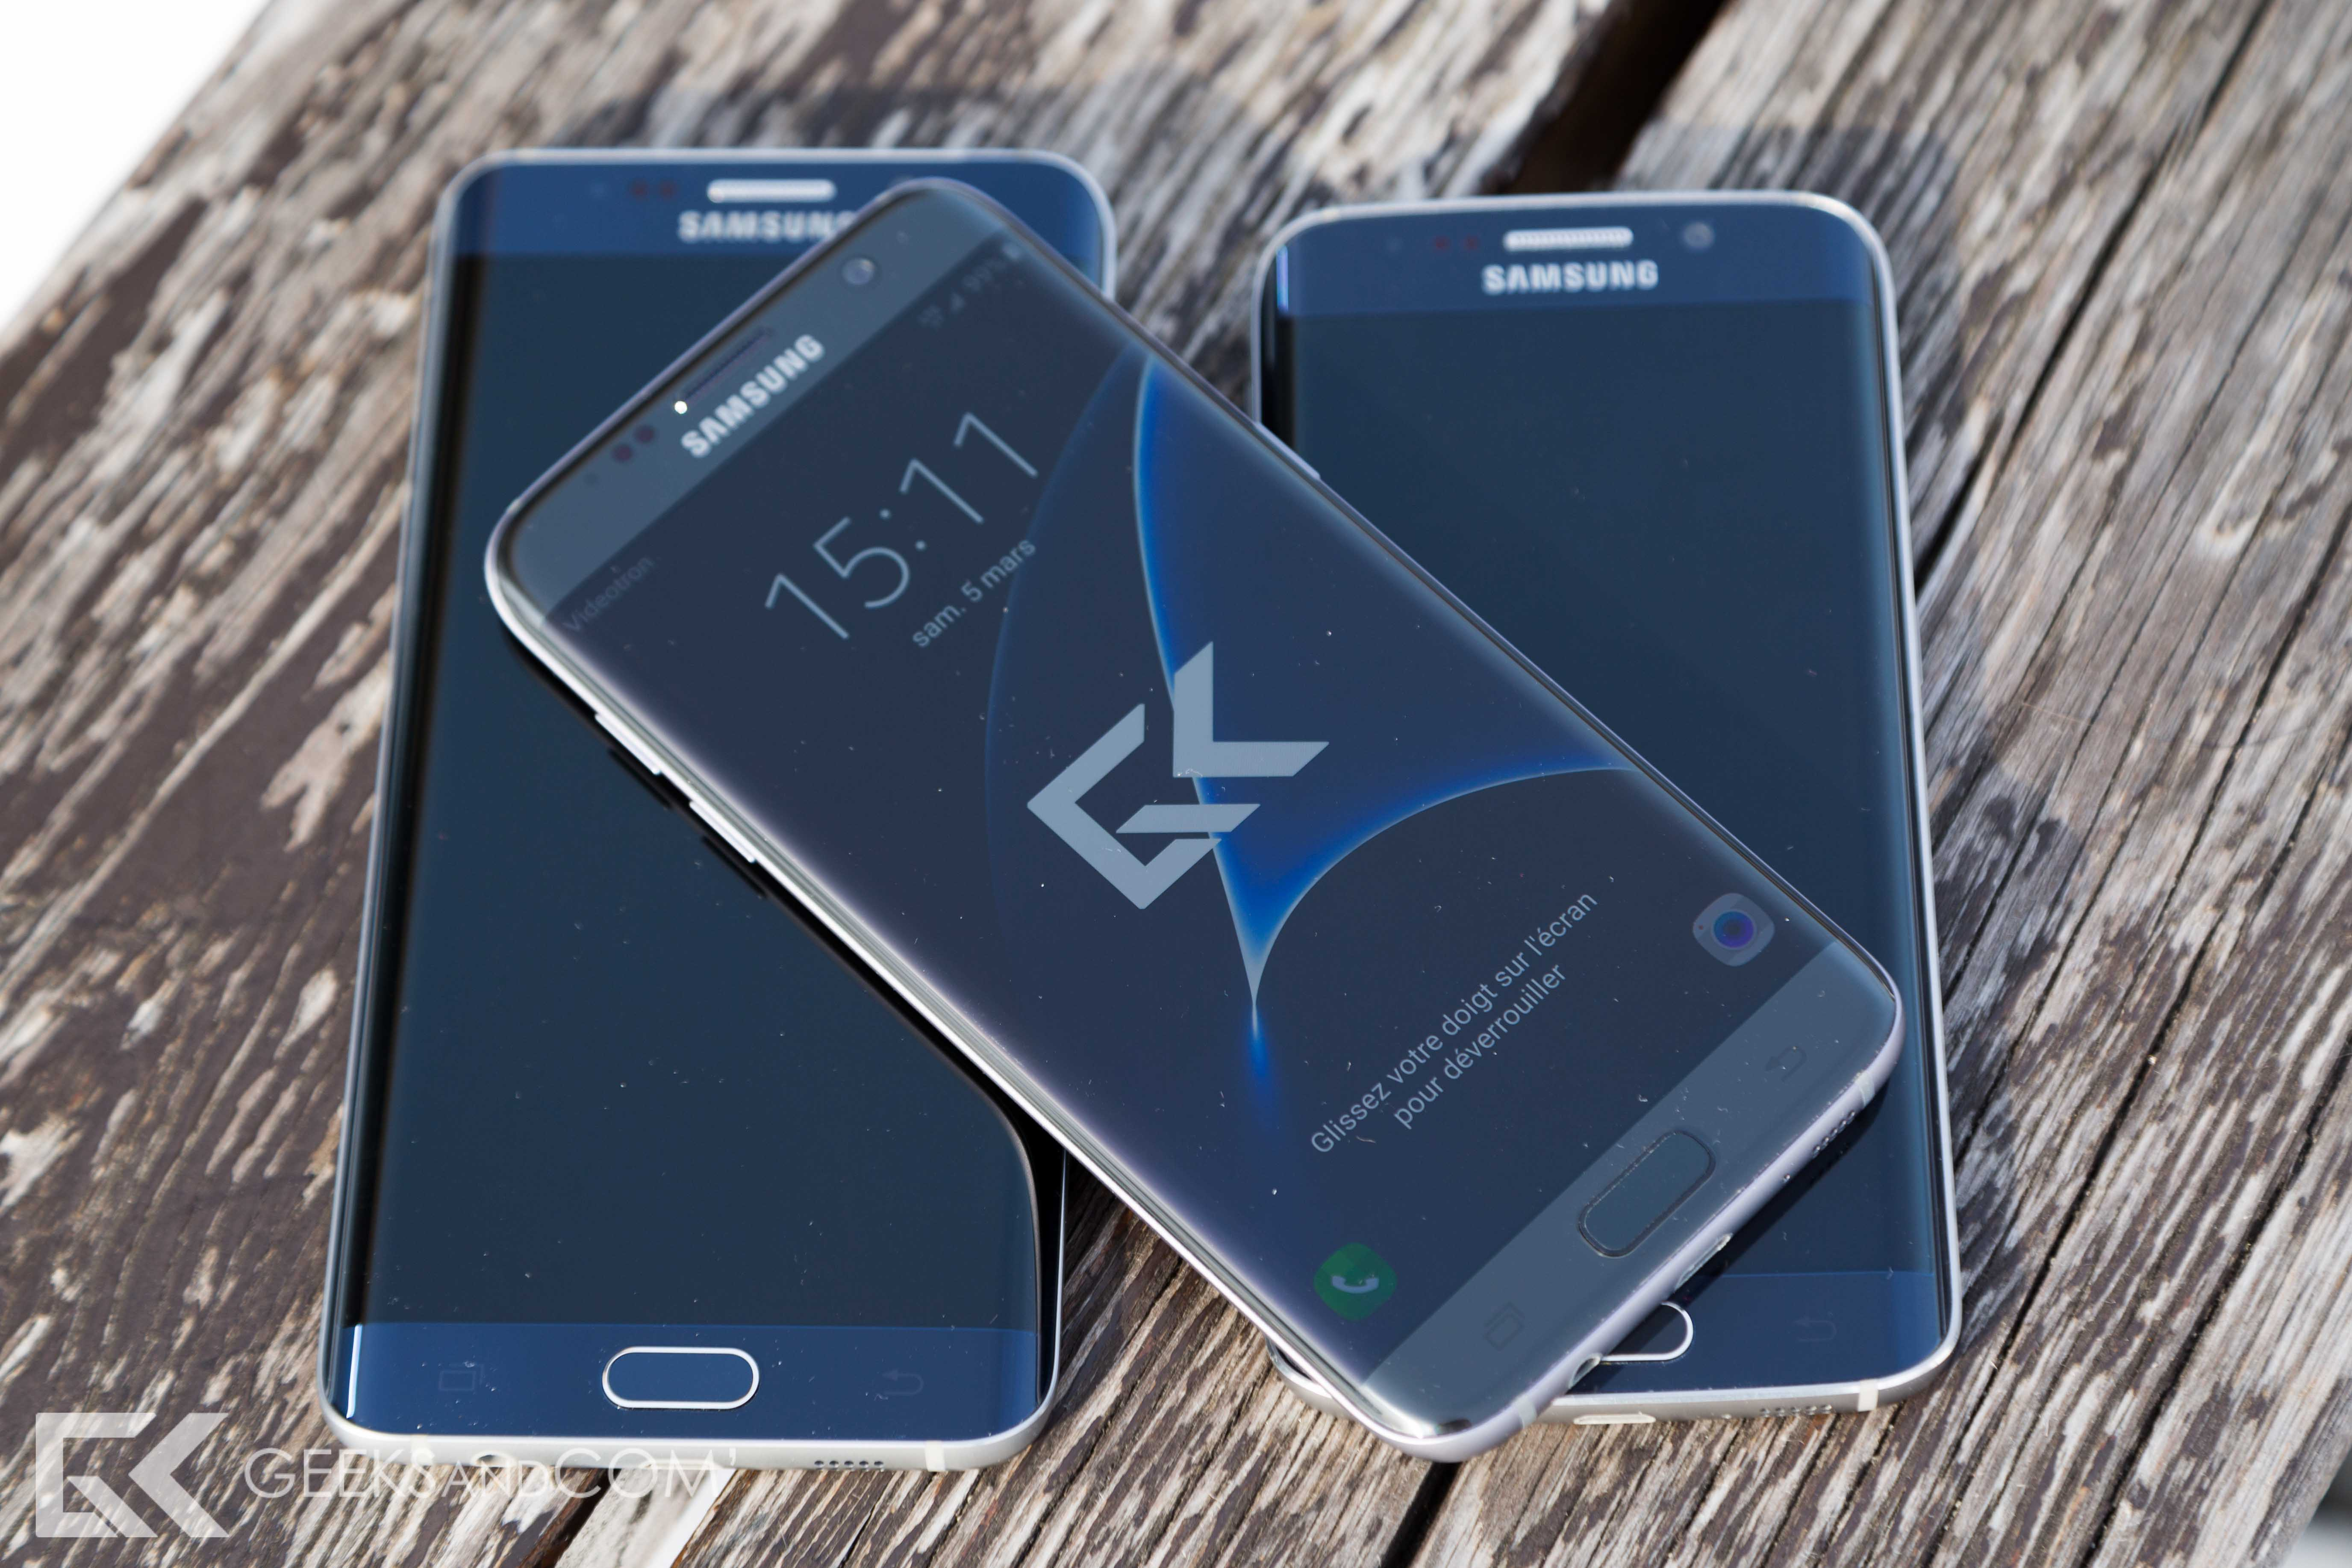 Samsung Galaxy S6 edge vs S7 edge vs S6 edge plus - Test Geeks and Com -5